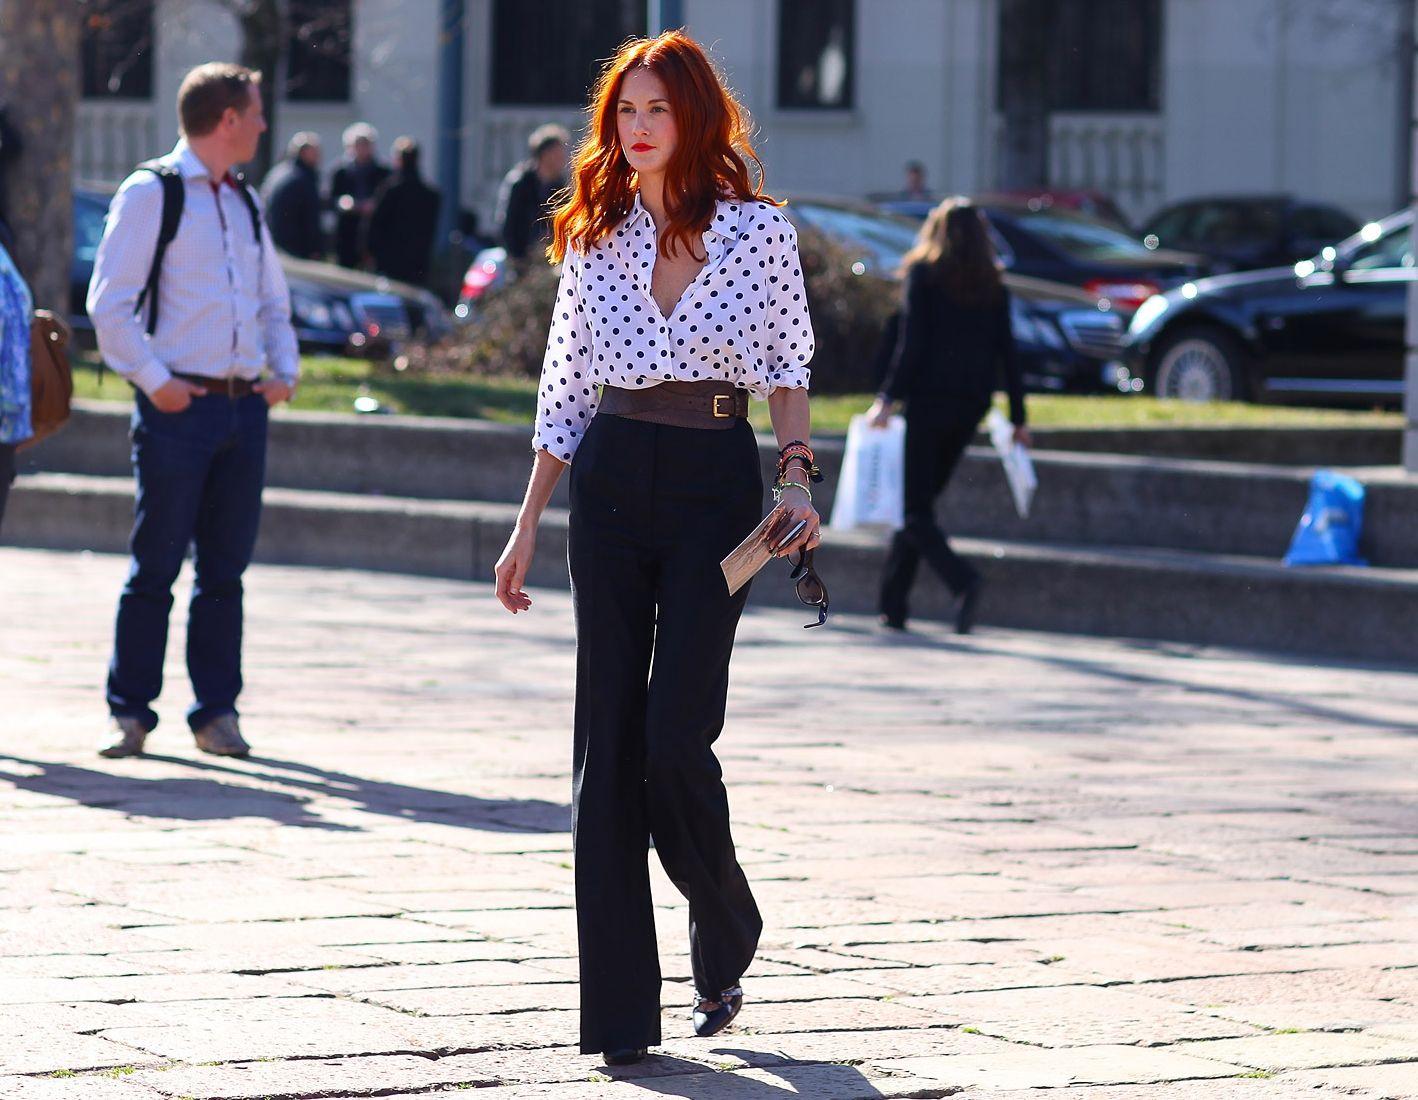 taylor-tomasi-hill-fall-2012-fashion-week-street-style-2 #dottedshirt